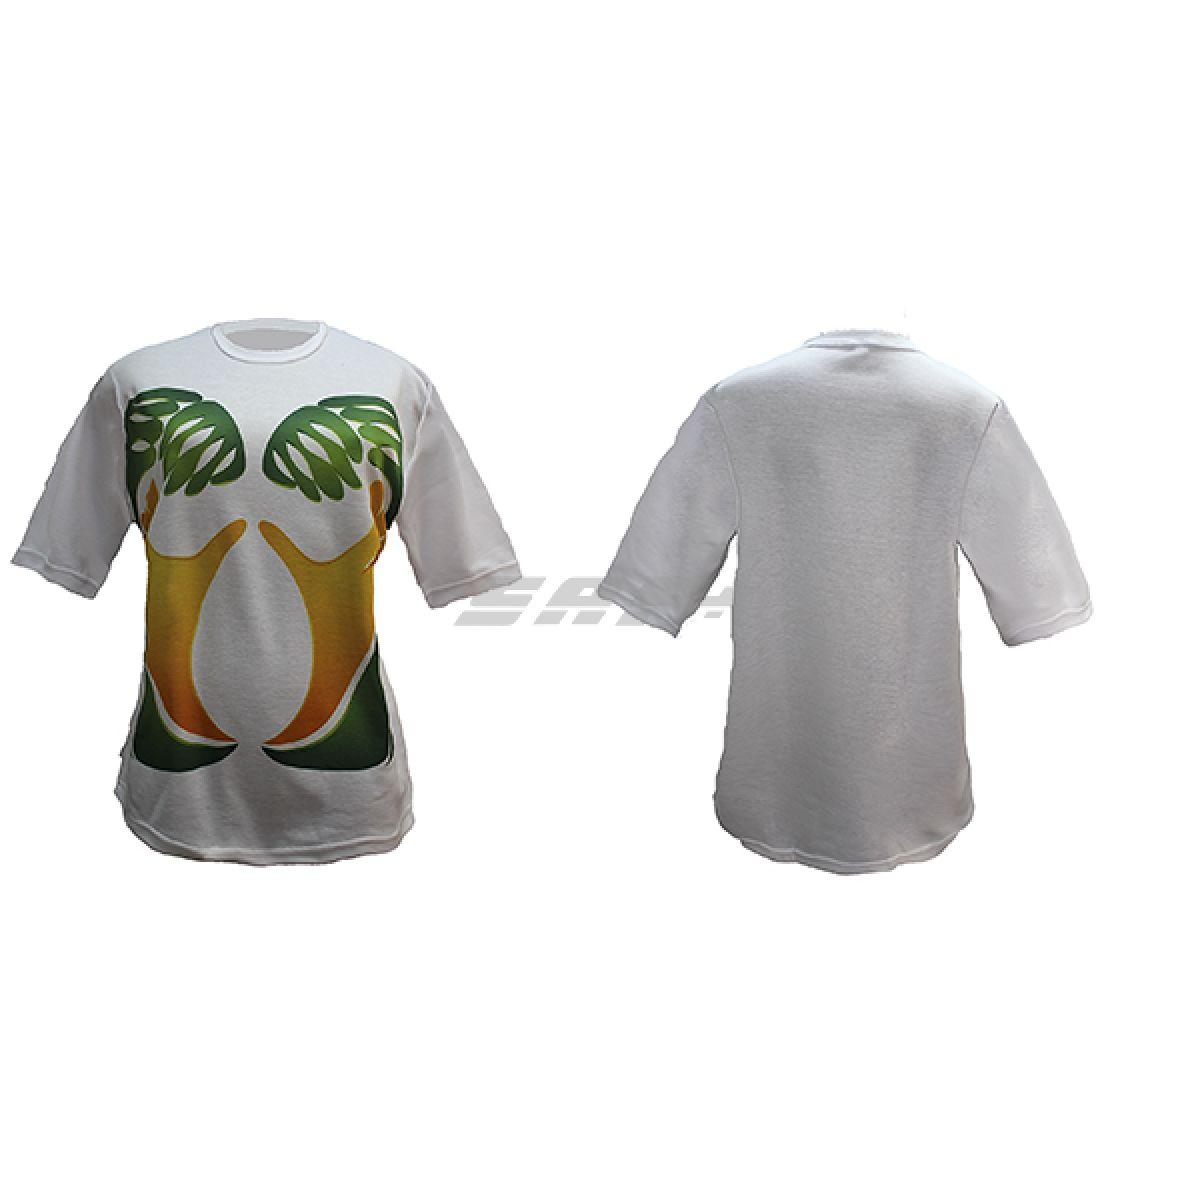 Сувенирная футболка